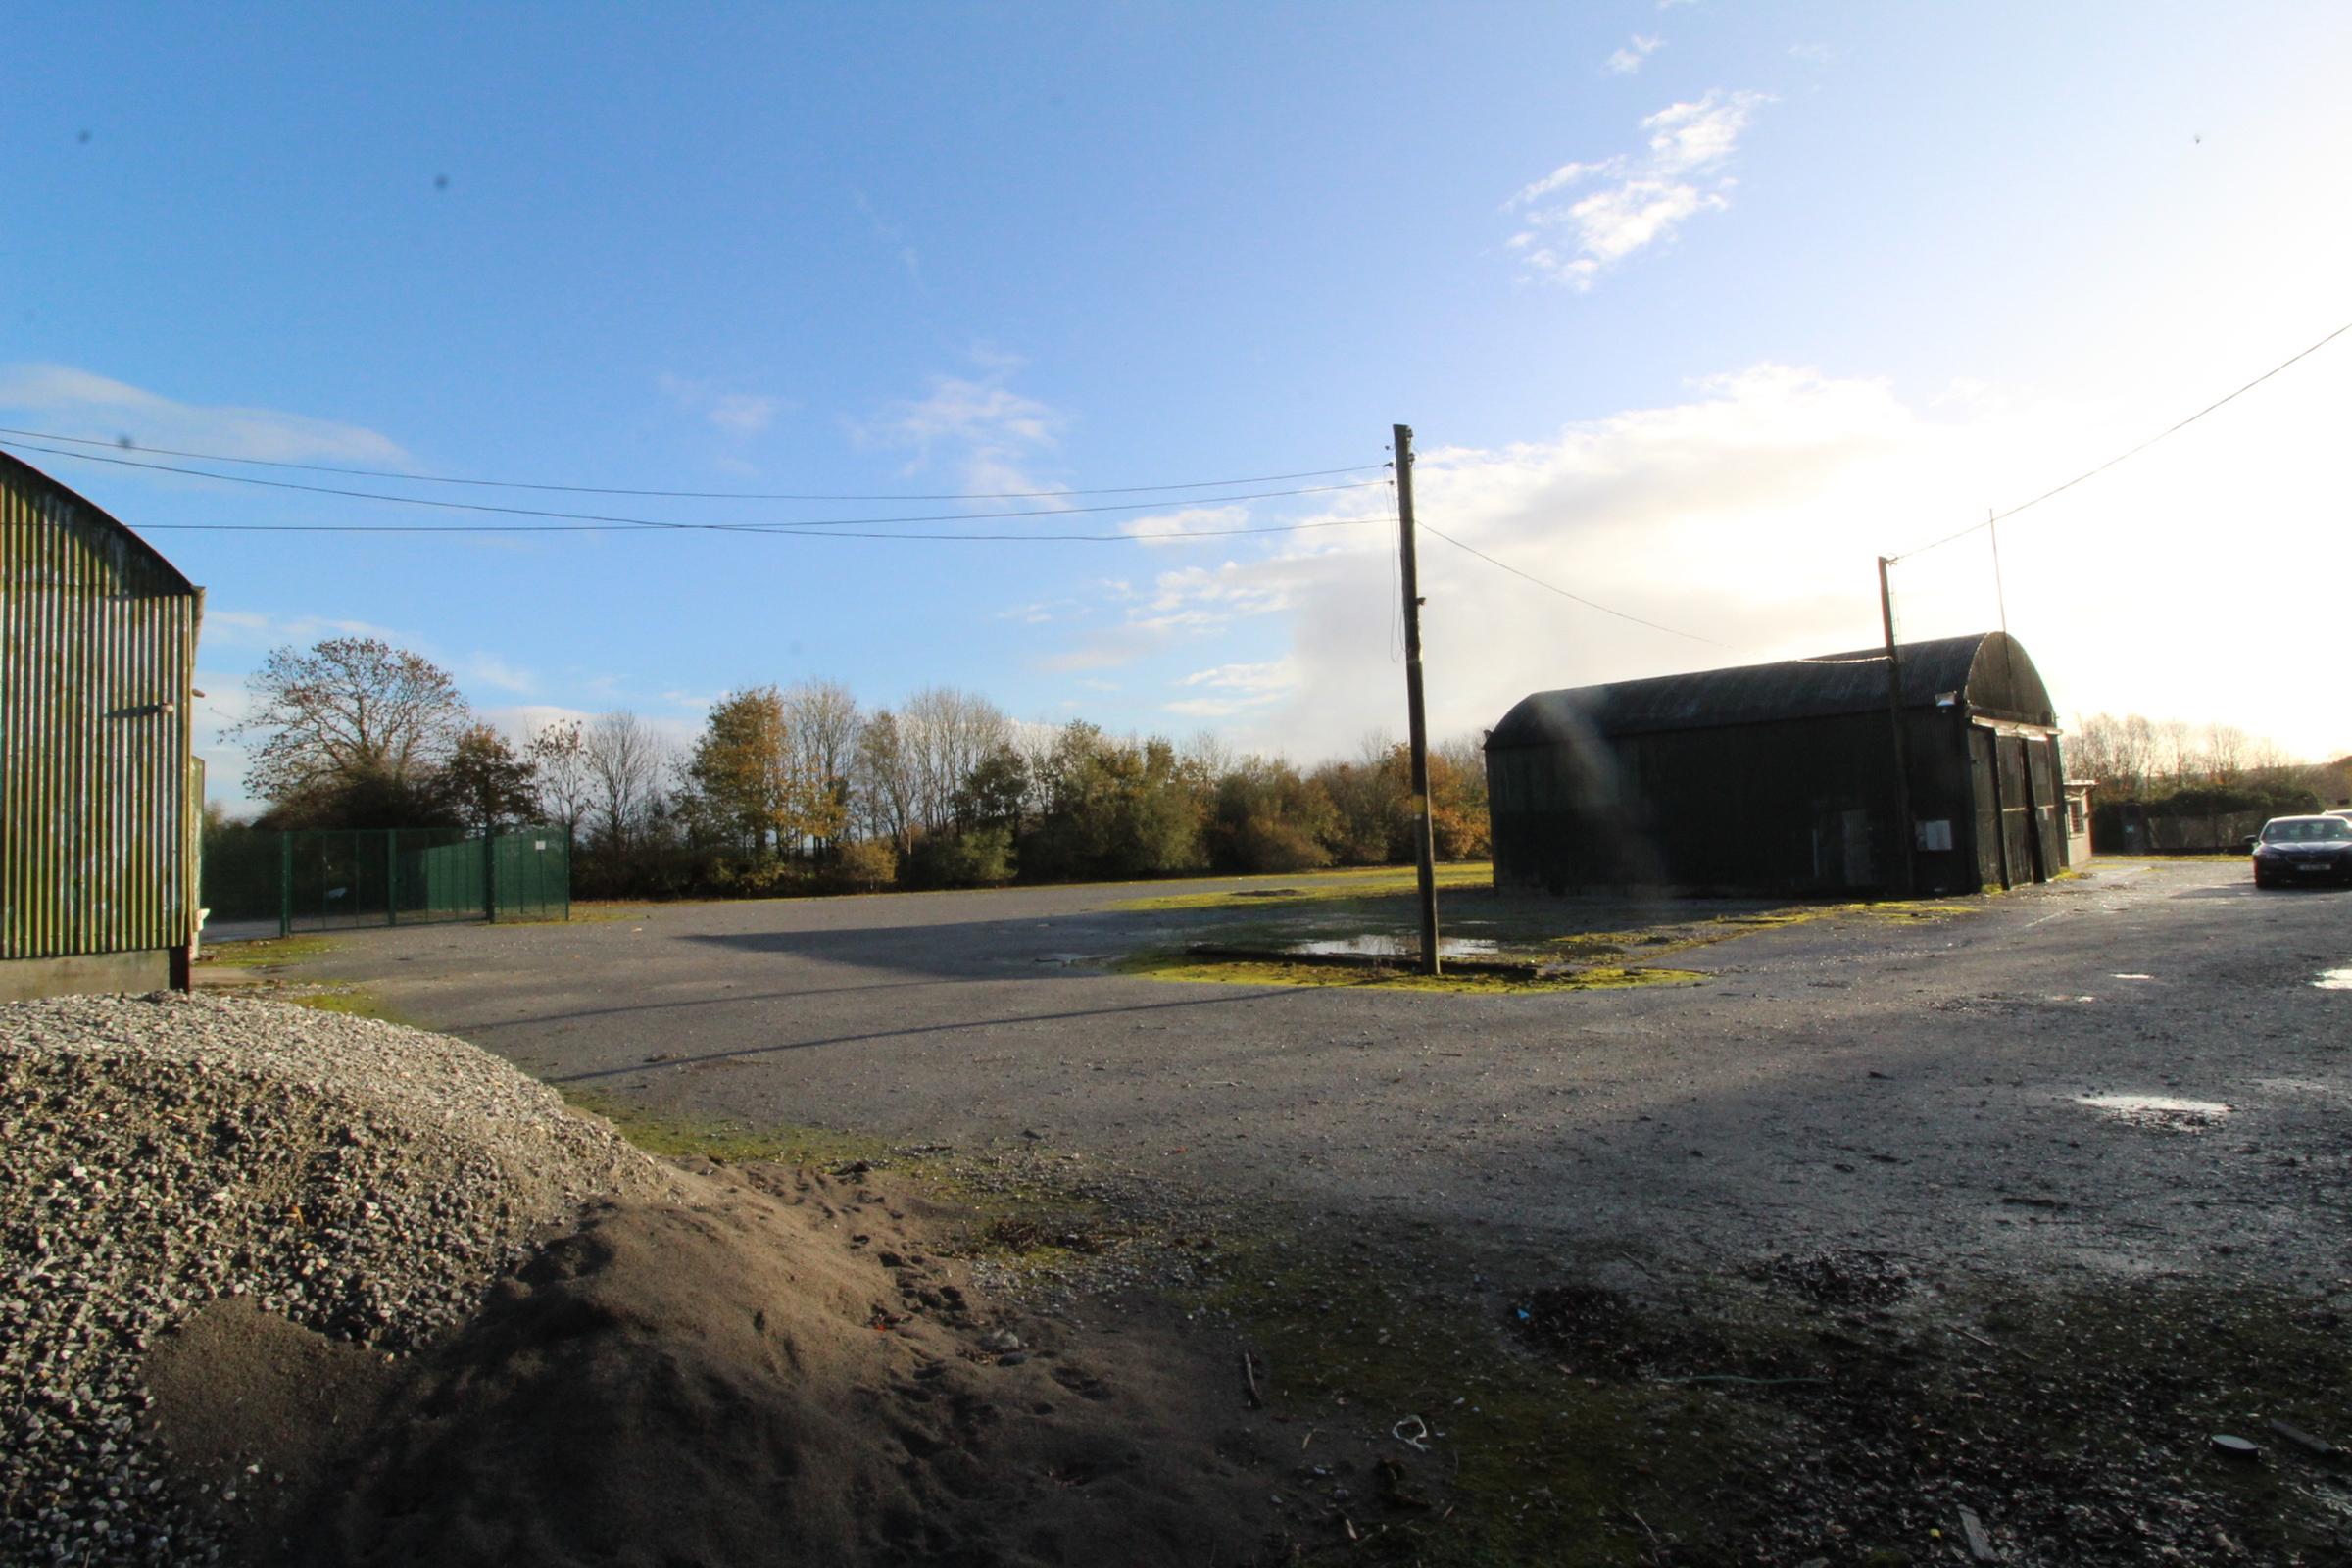 Station Road, Blarney, Co. Cork